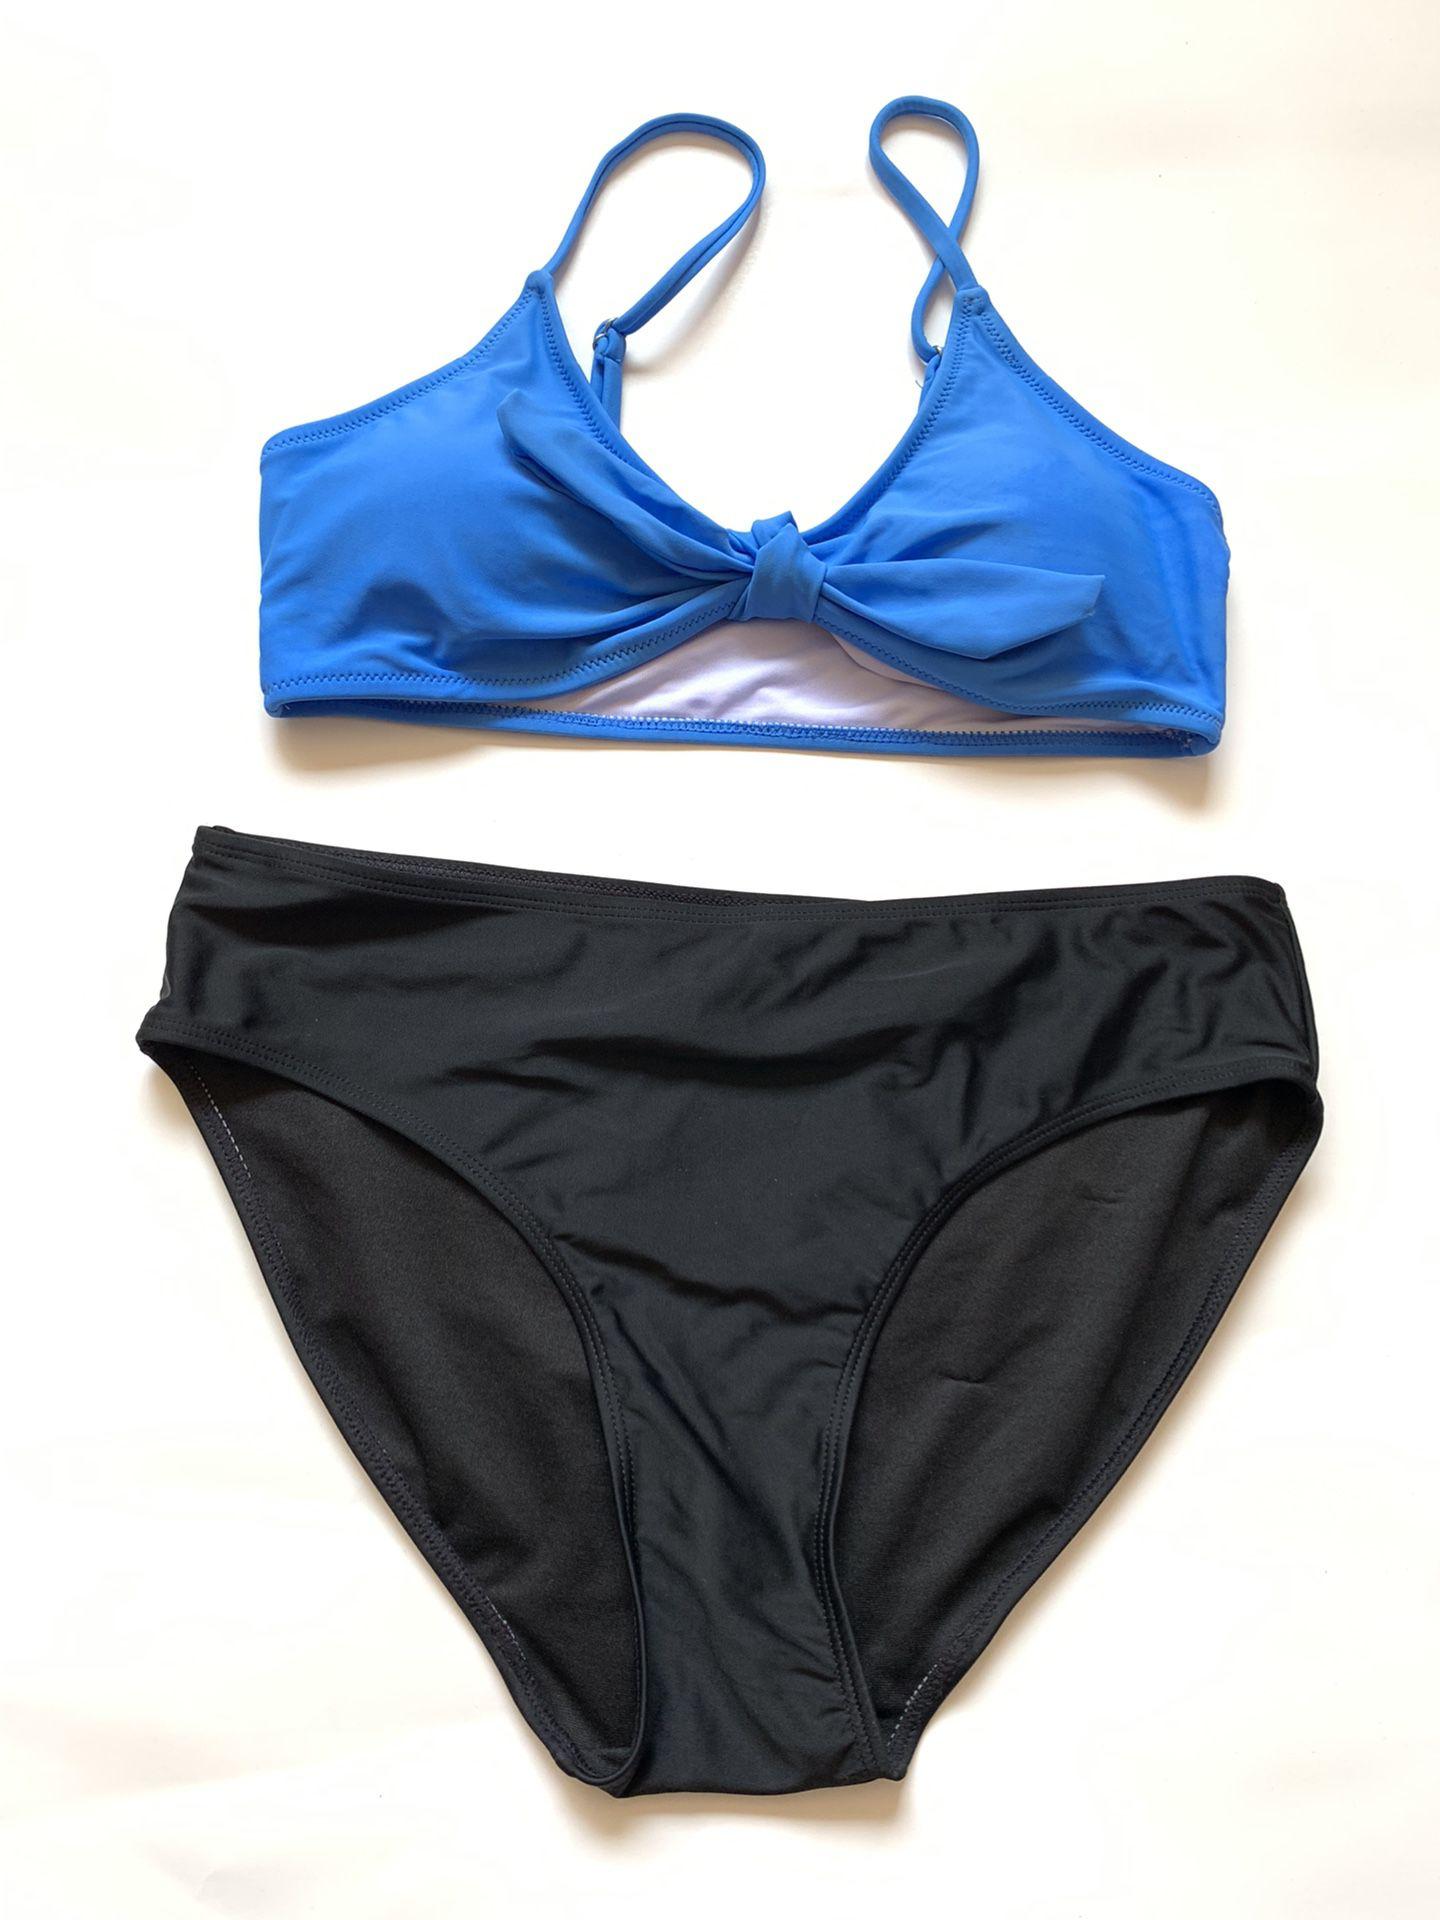 New Women's Bathing Set Size Medium Top Large Bottoms